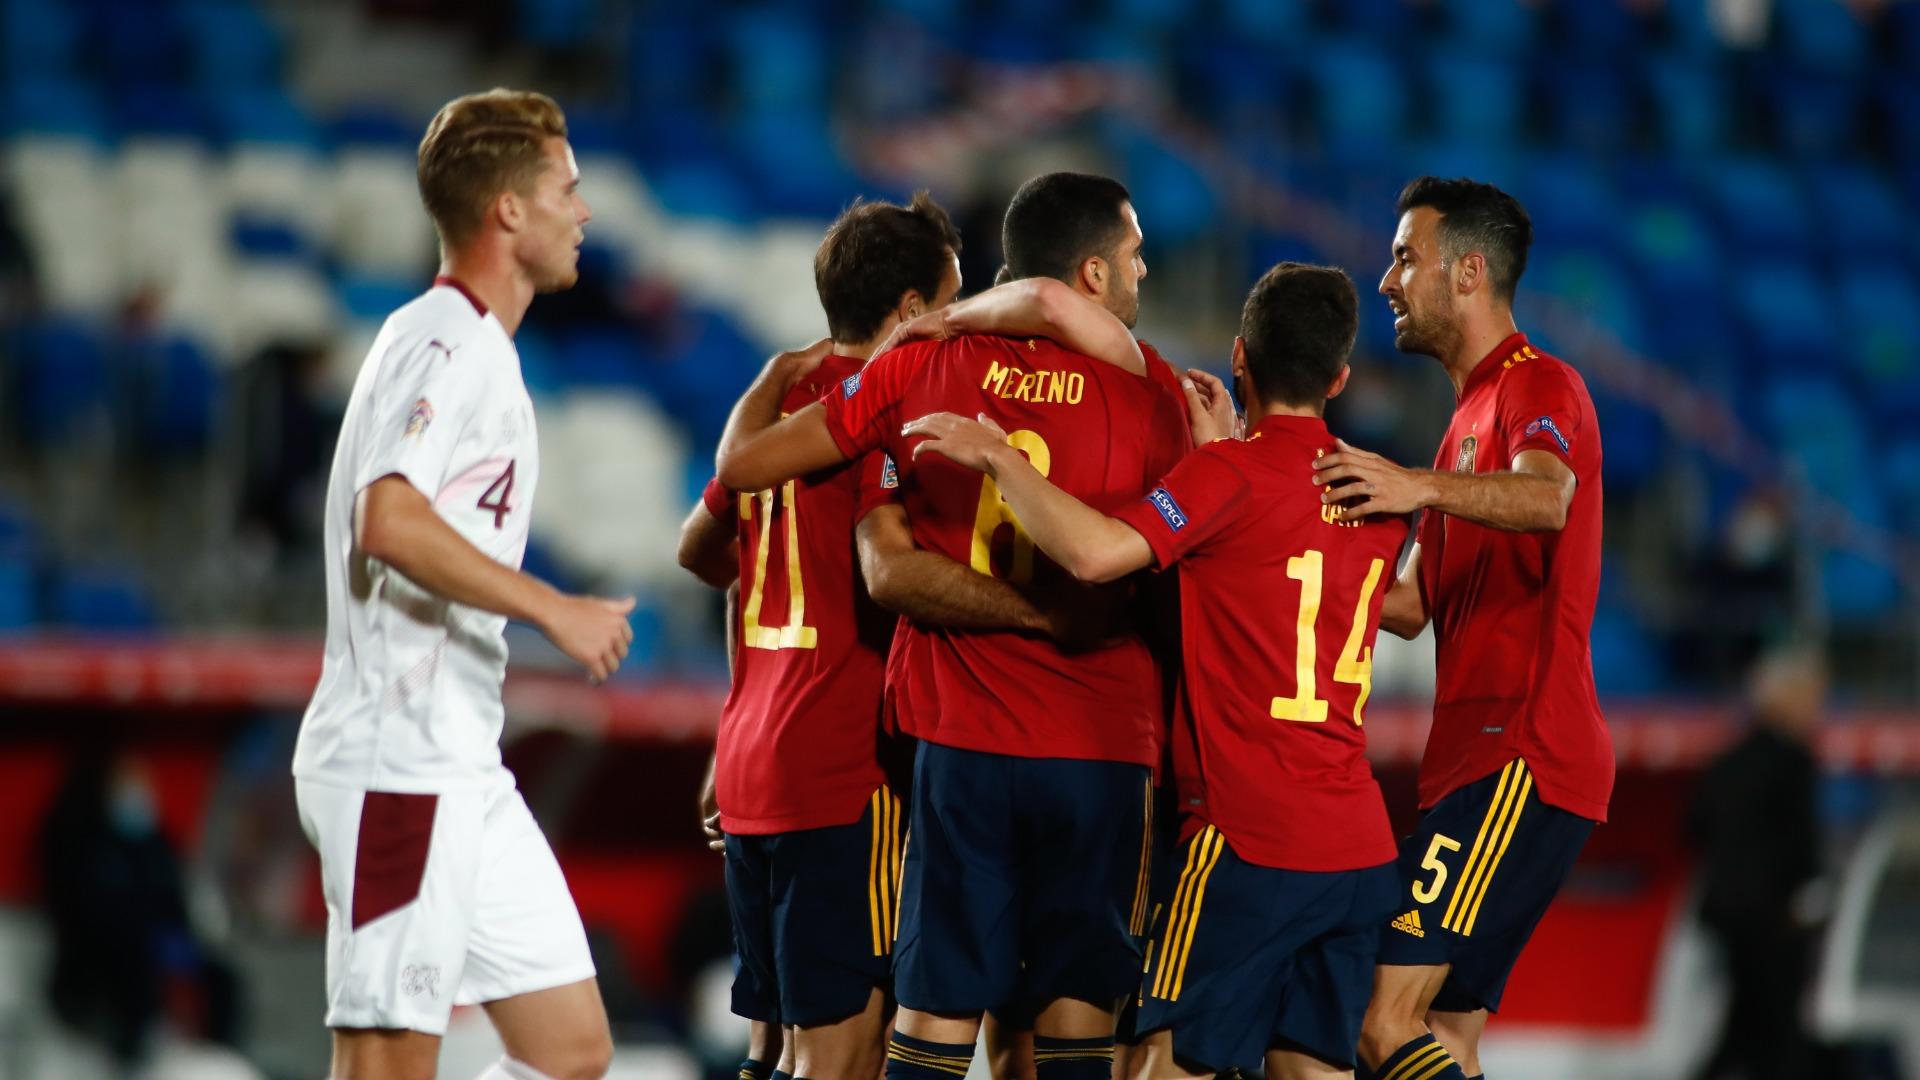 Spain 1-0 Switzerland: La Roja's unbeaten run continues as Oyarzabal proves decisive